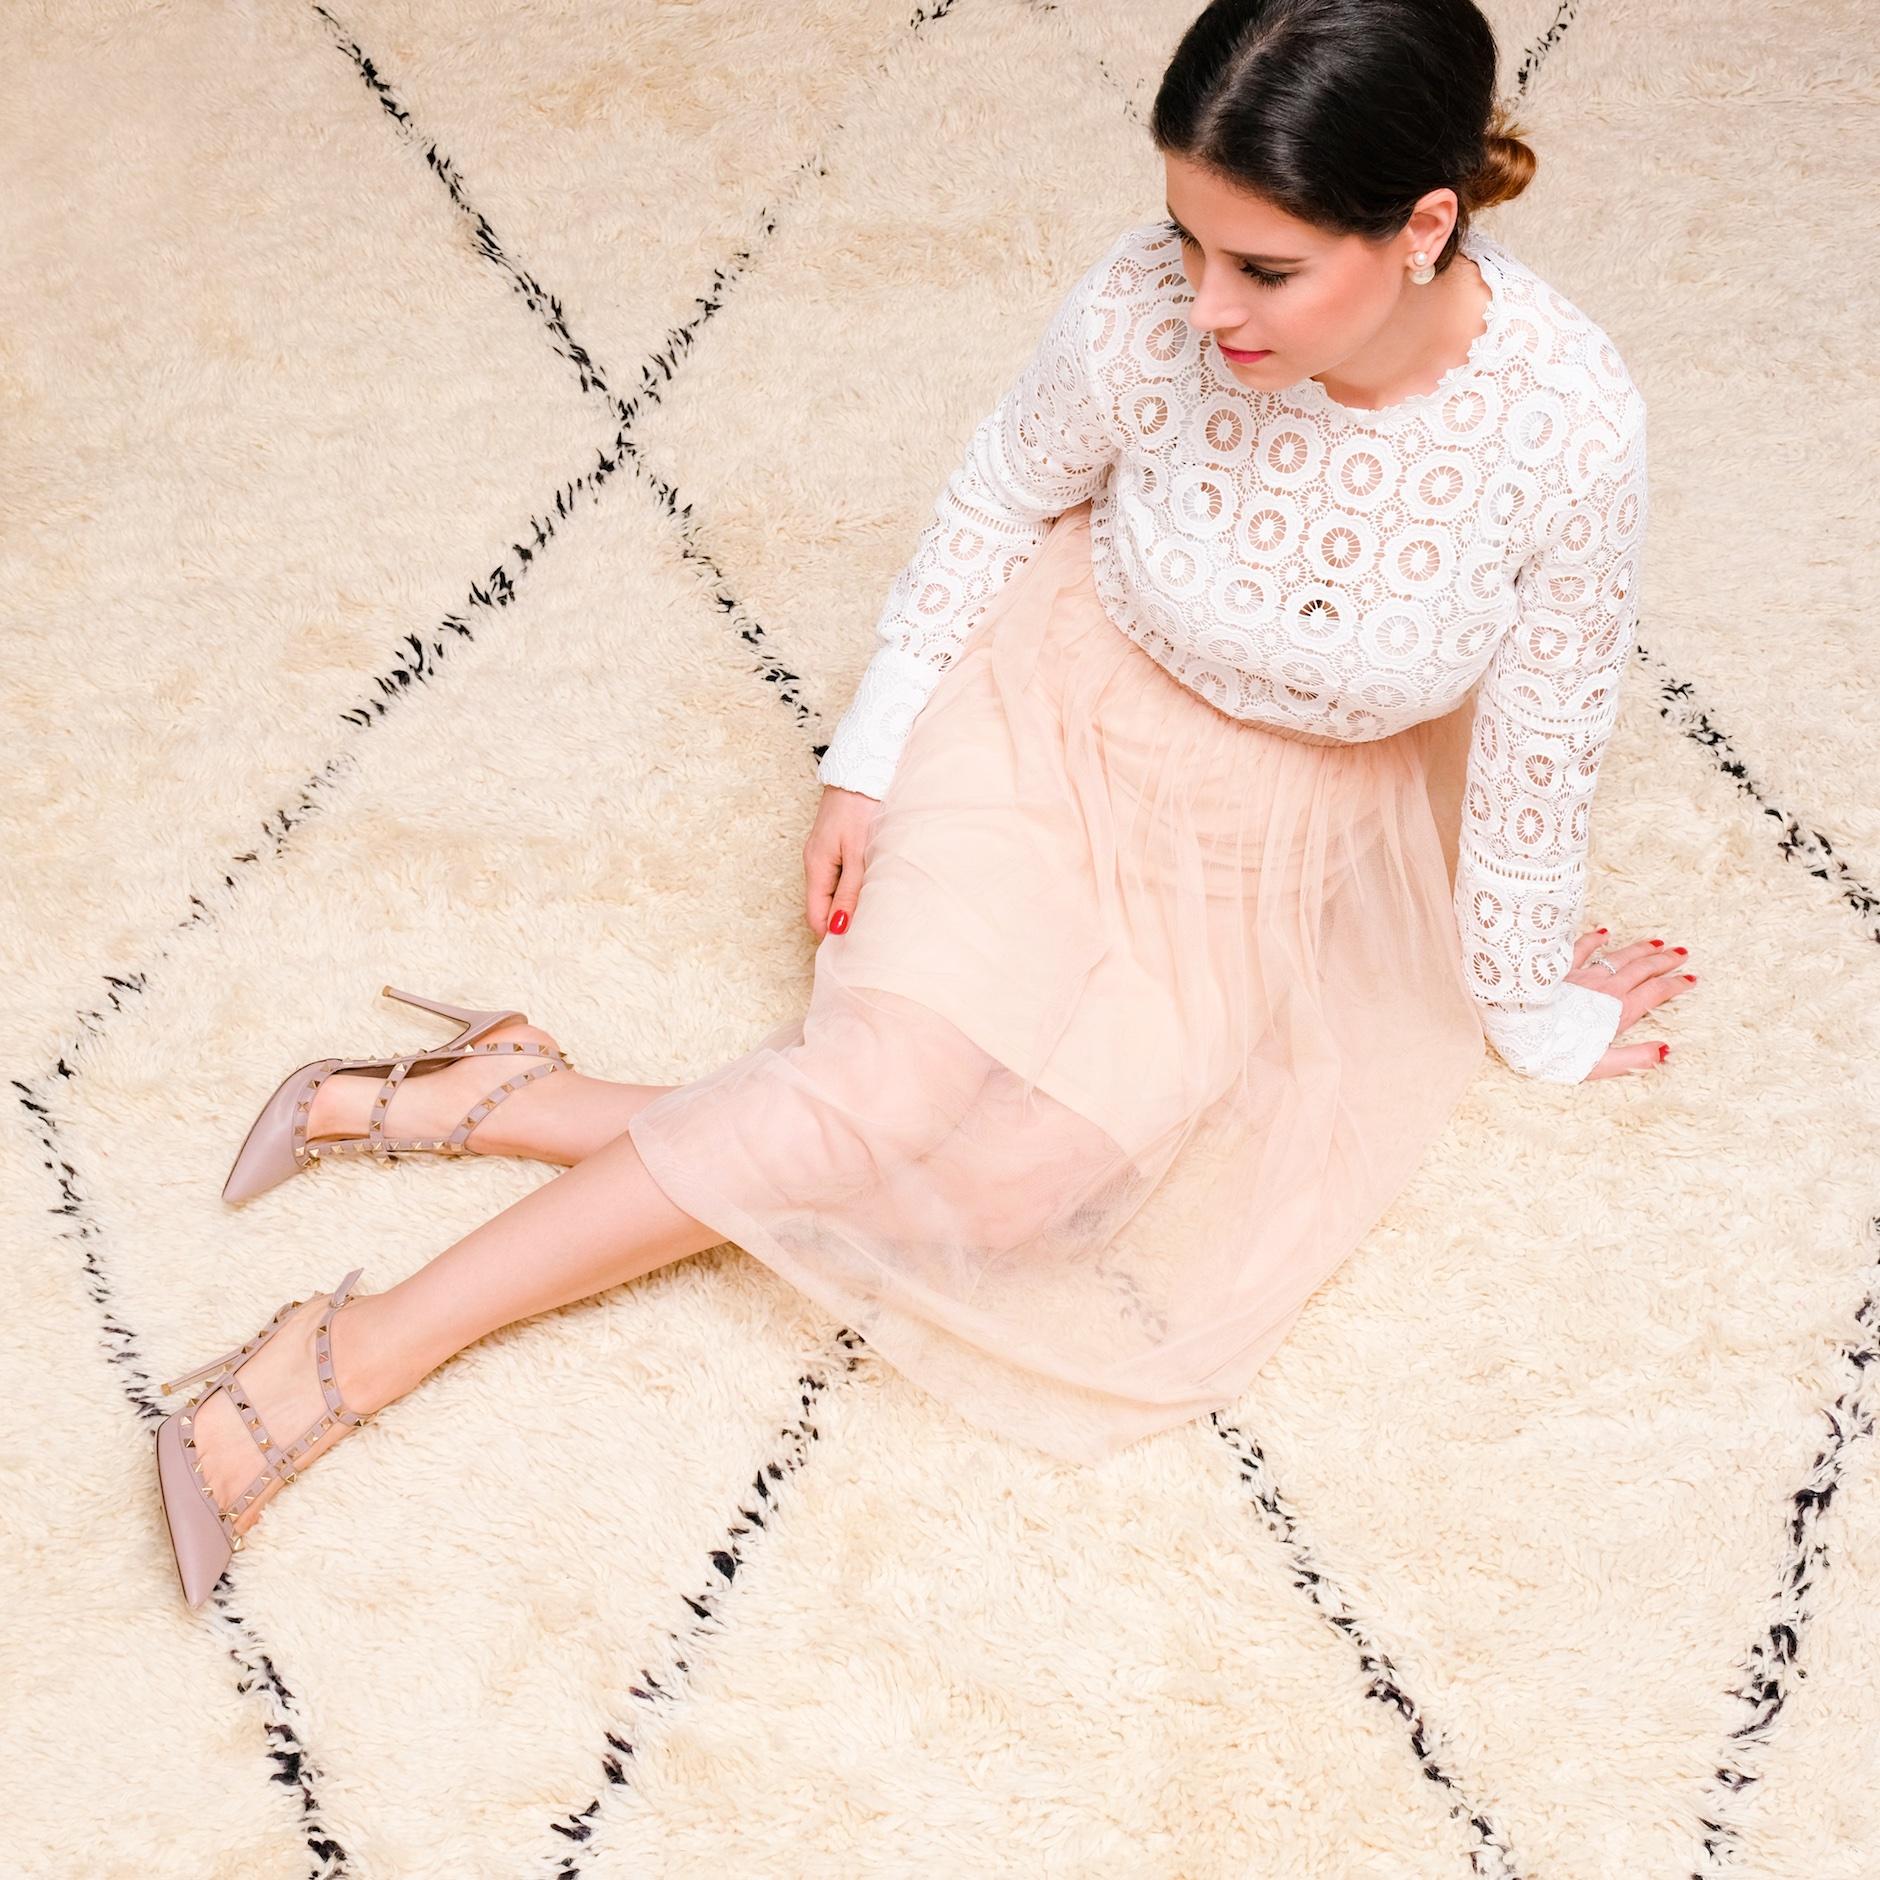 ballerina-look-edited-label-2